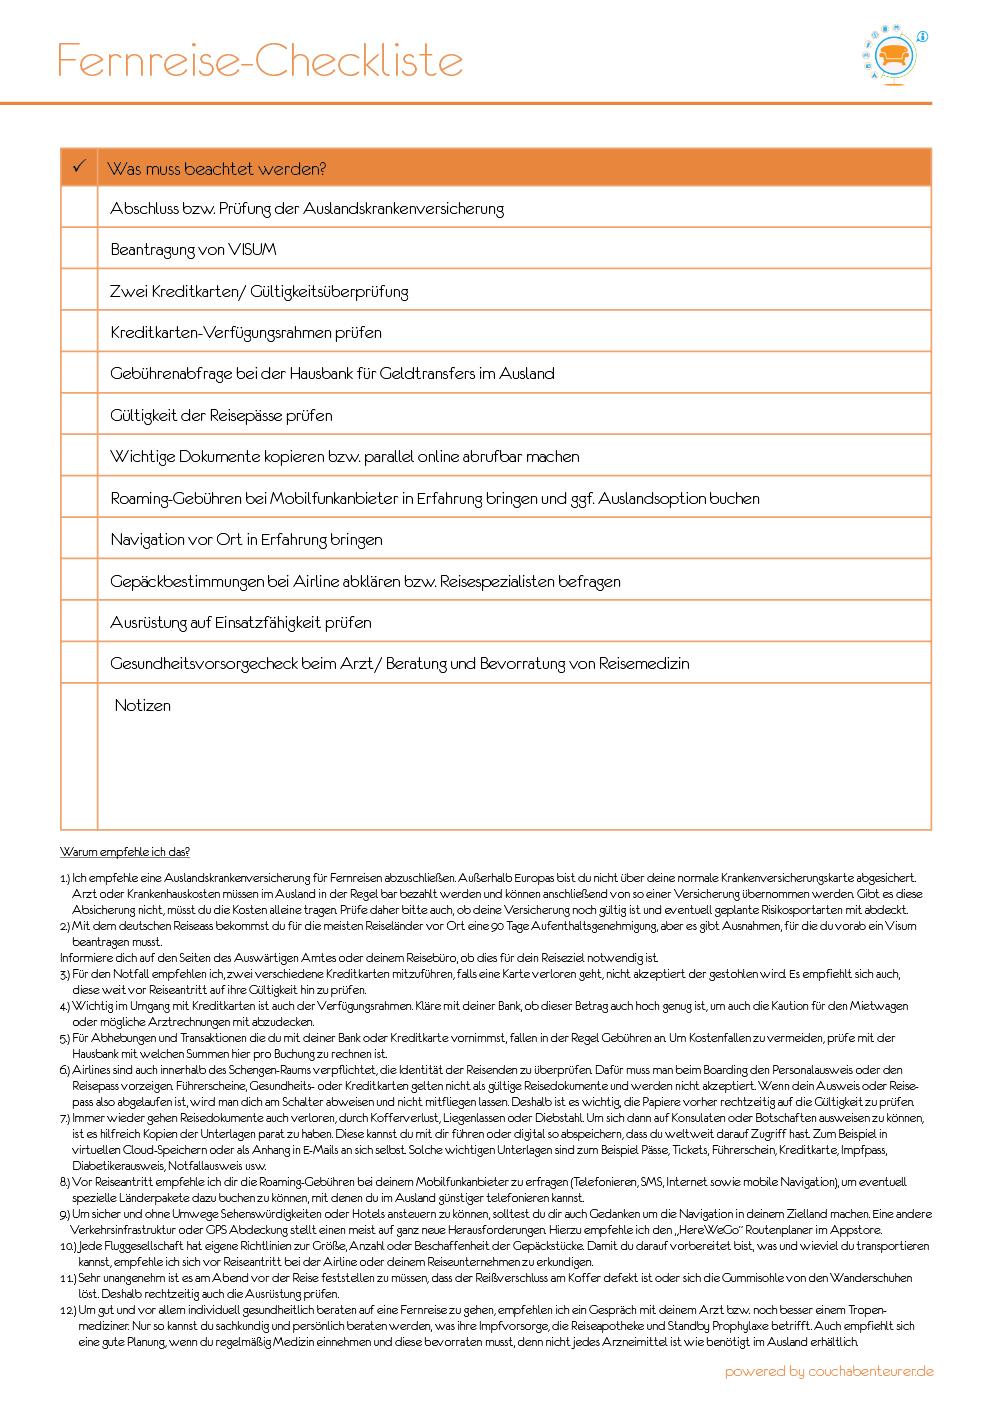 Fernreise Checkliste